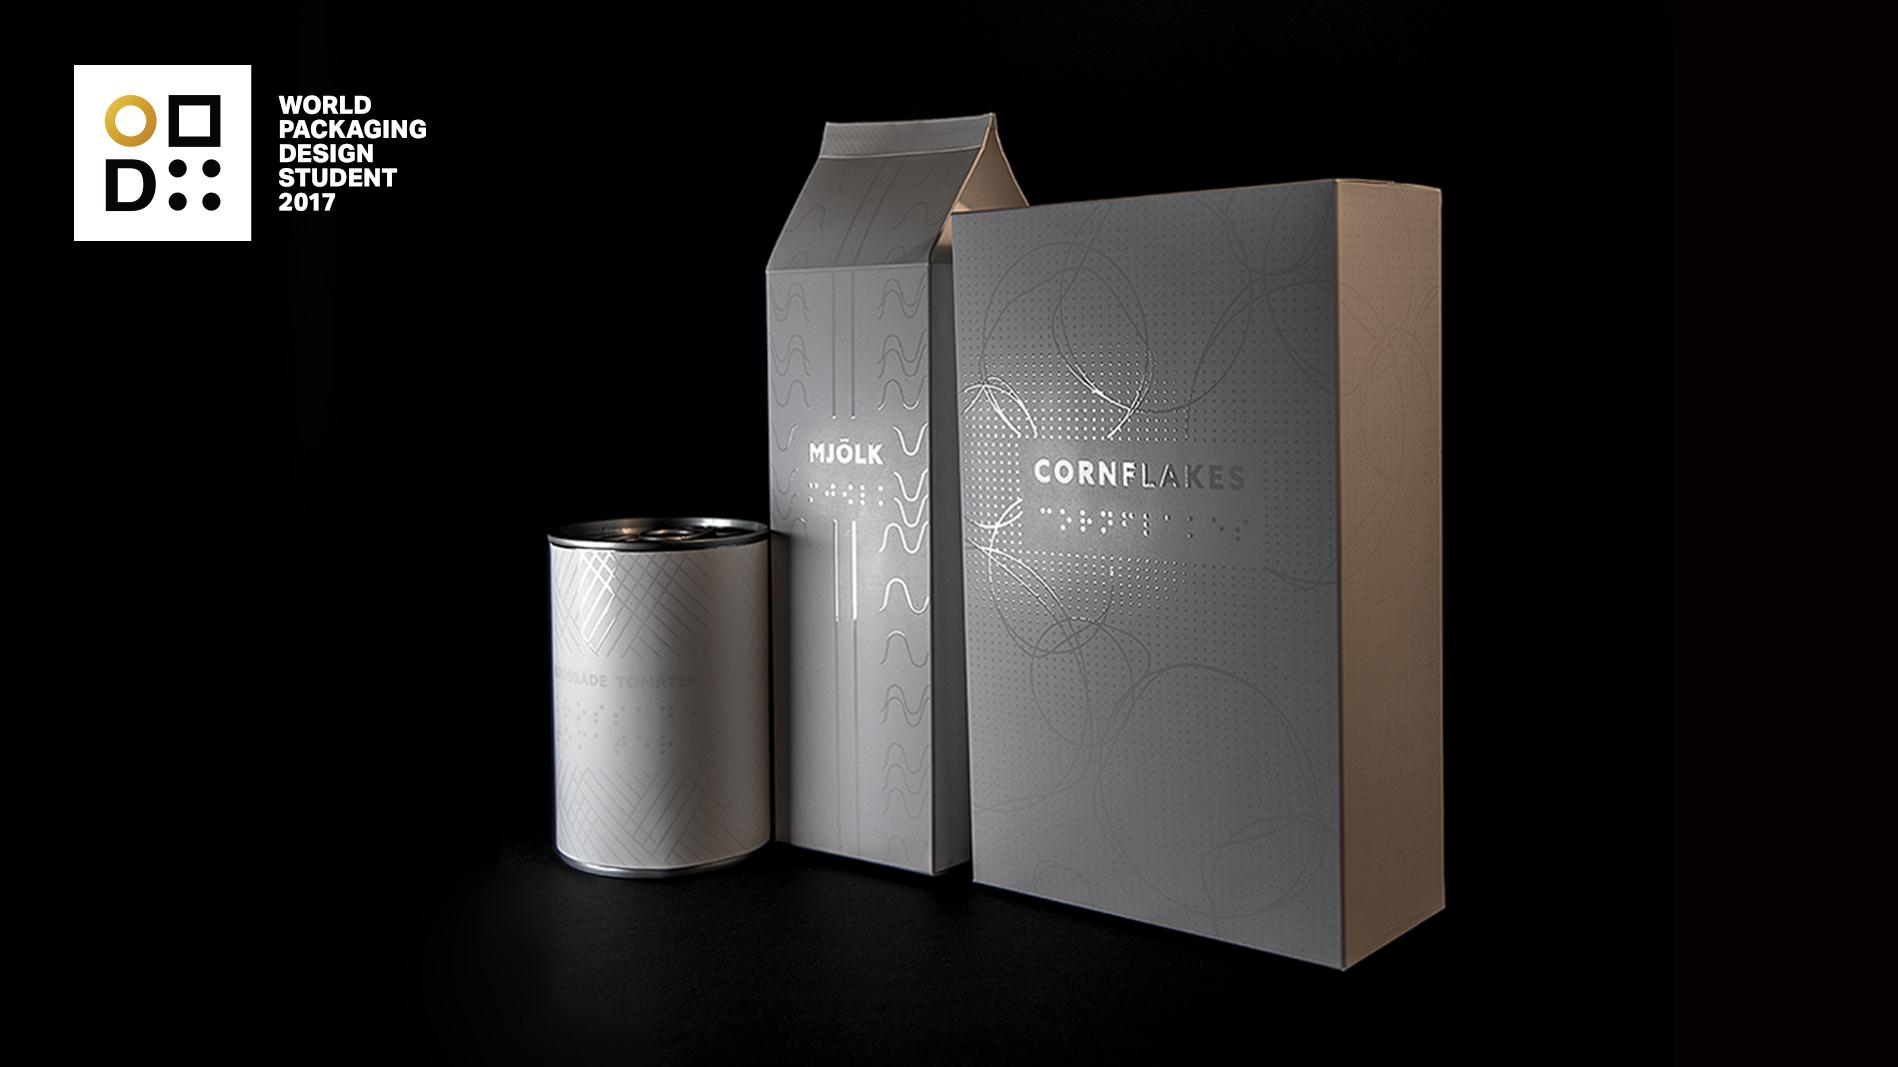 1-alexandra-burling-world-packaging-design-student.jpg